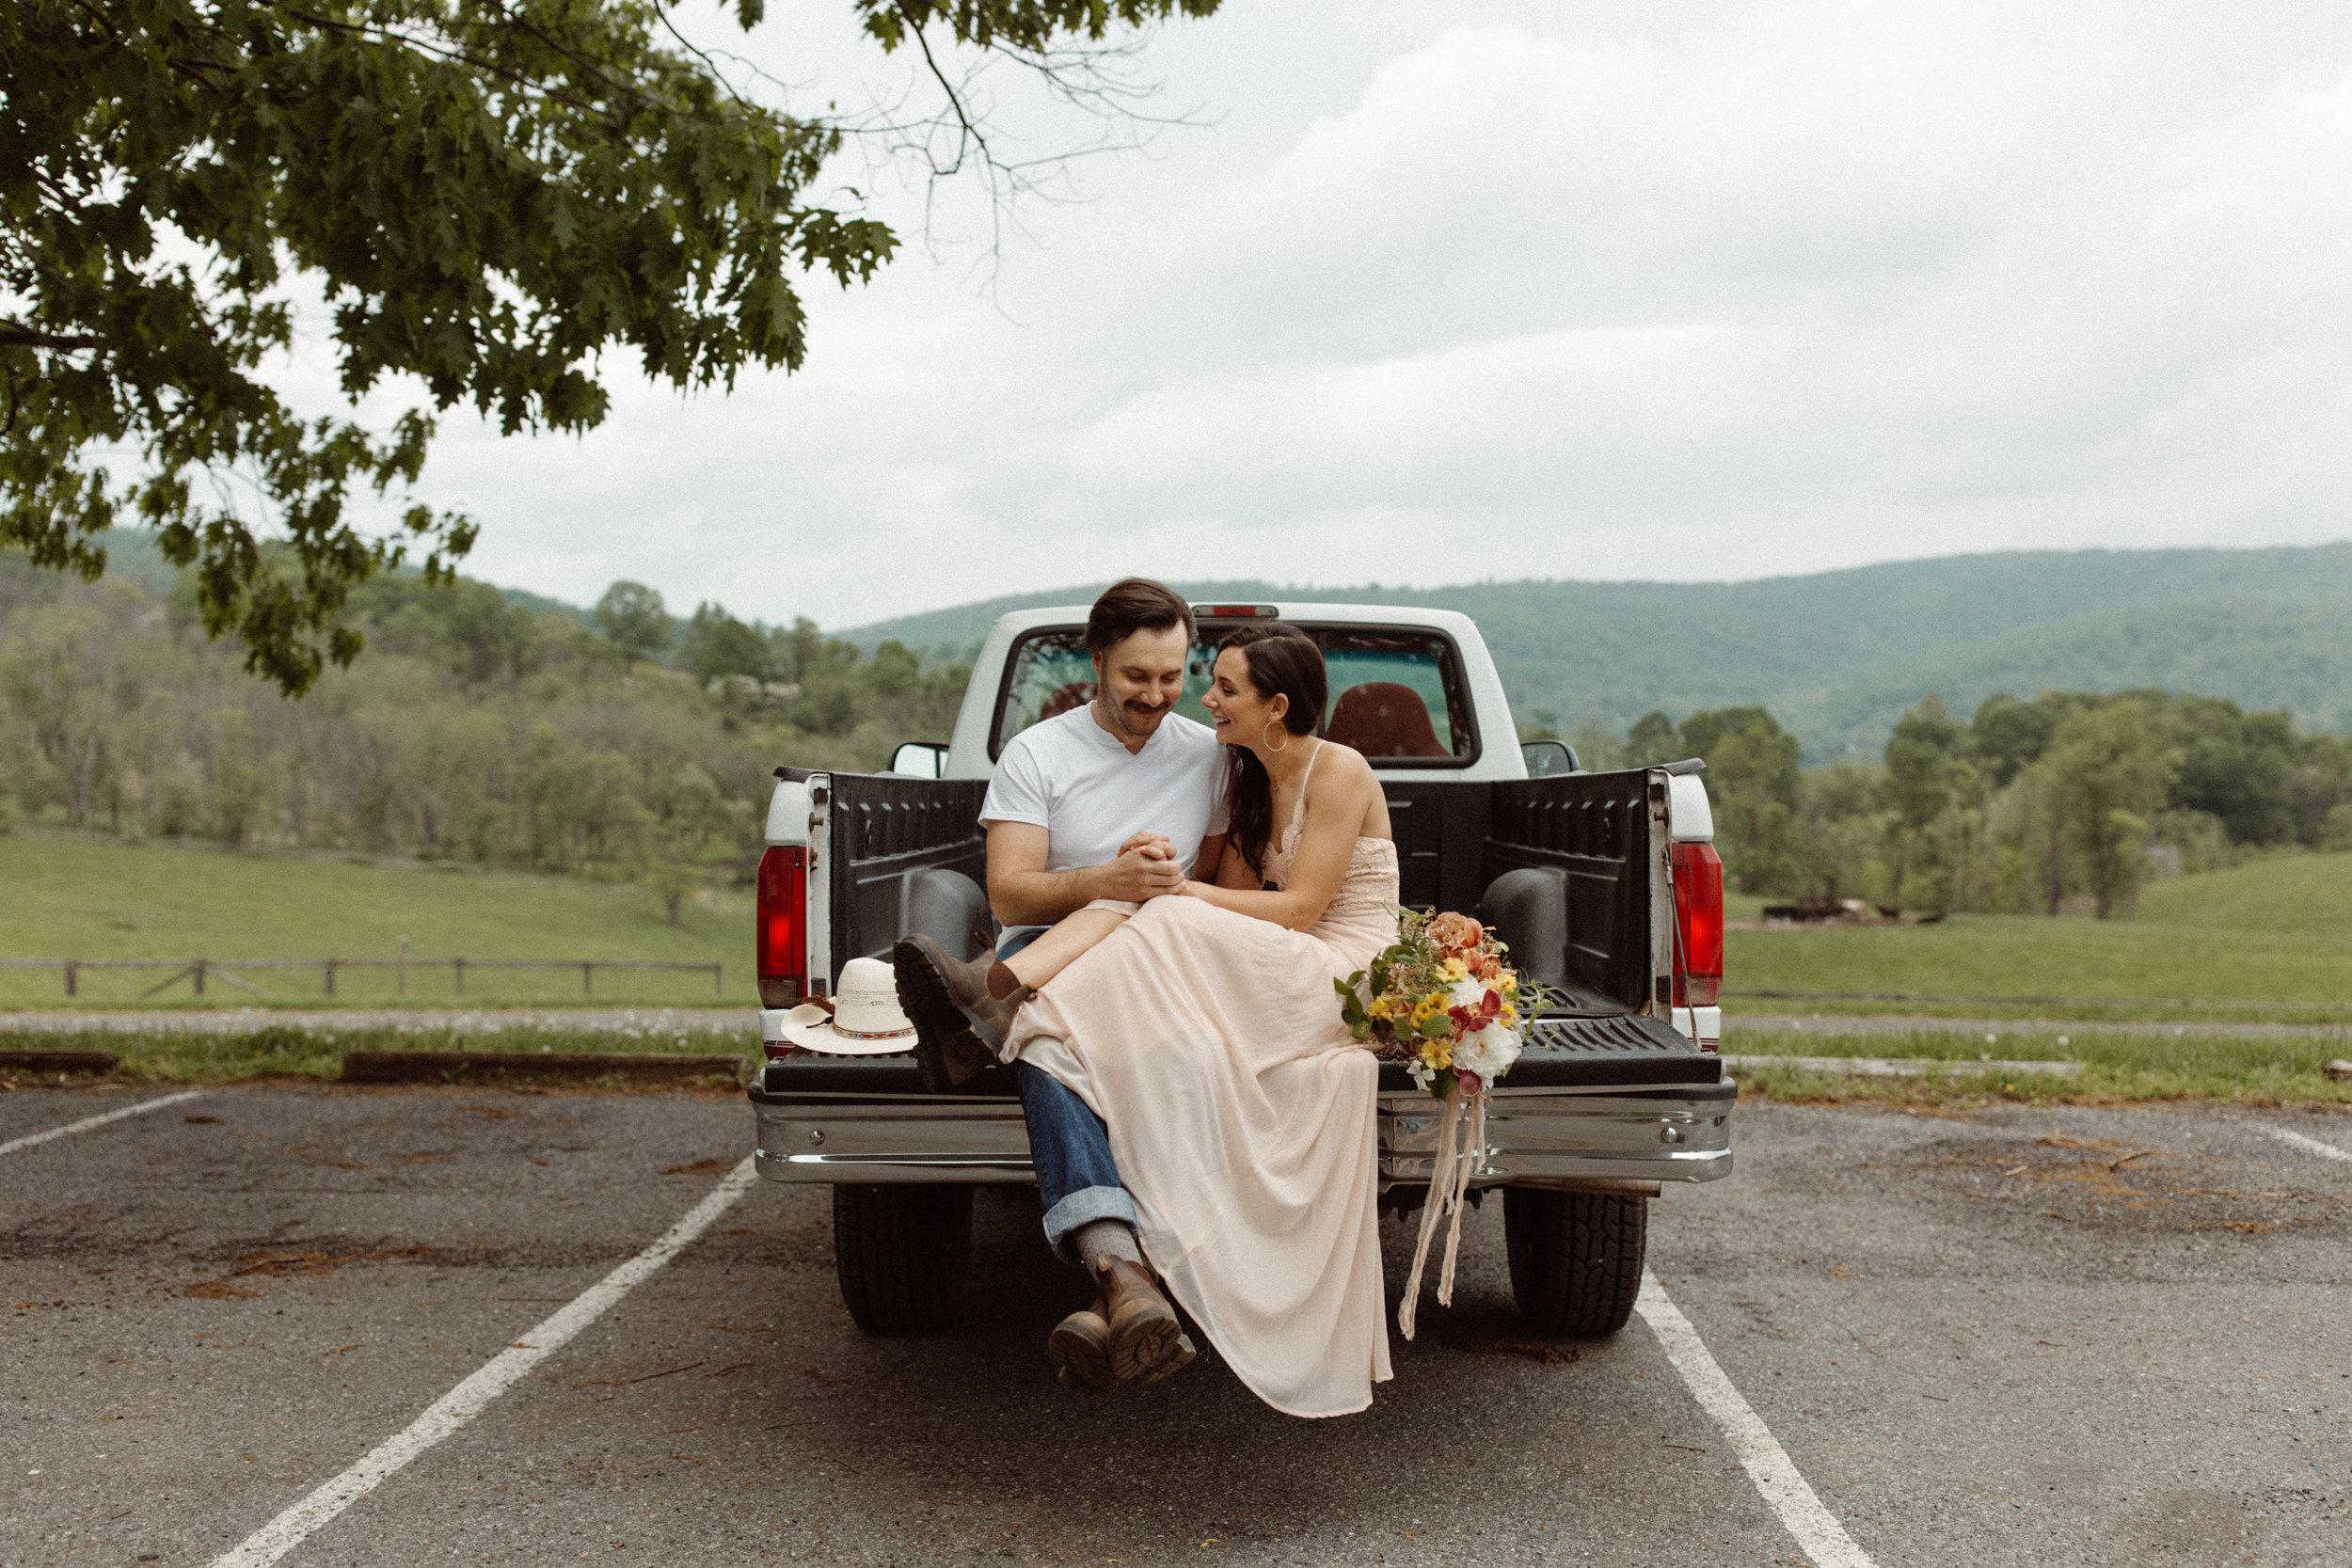 kelsey&mark-engagement-skymeadows-2019-peytoncurry-8437.jpg